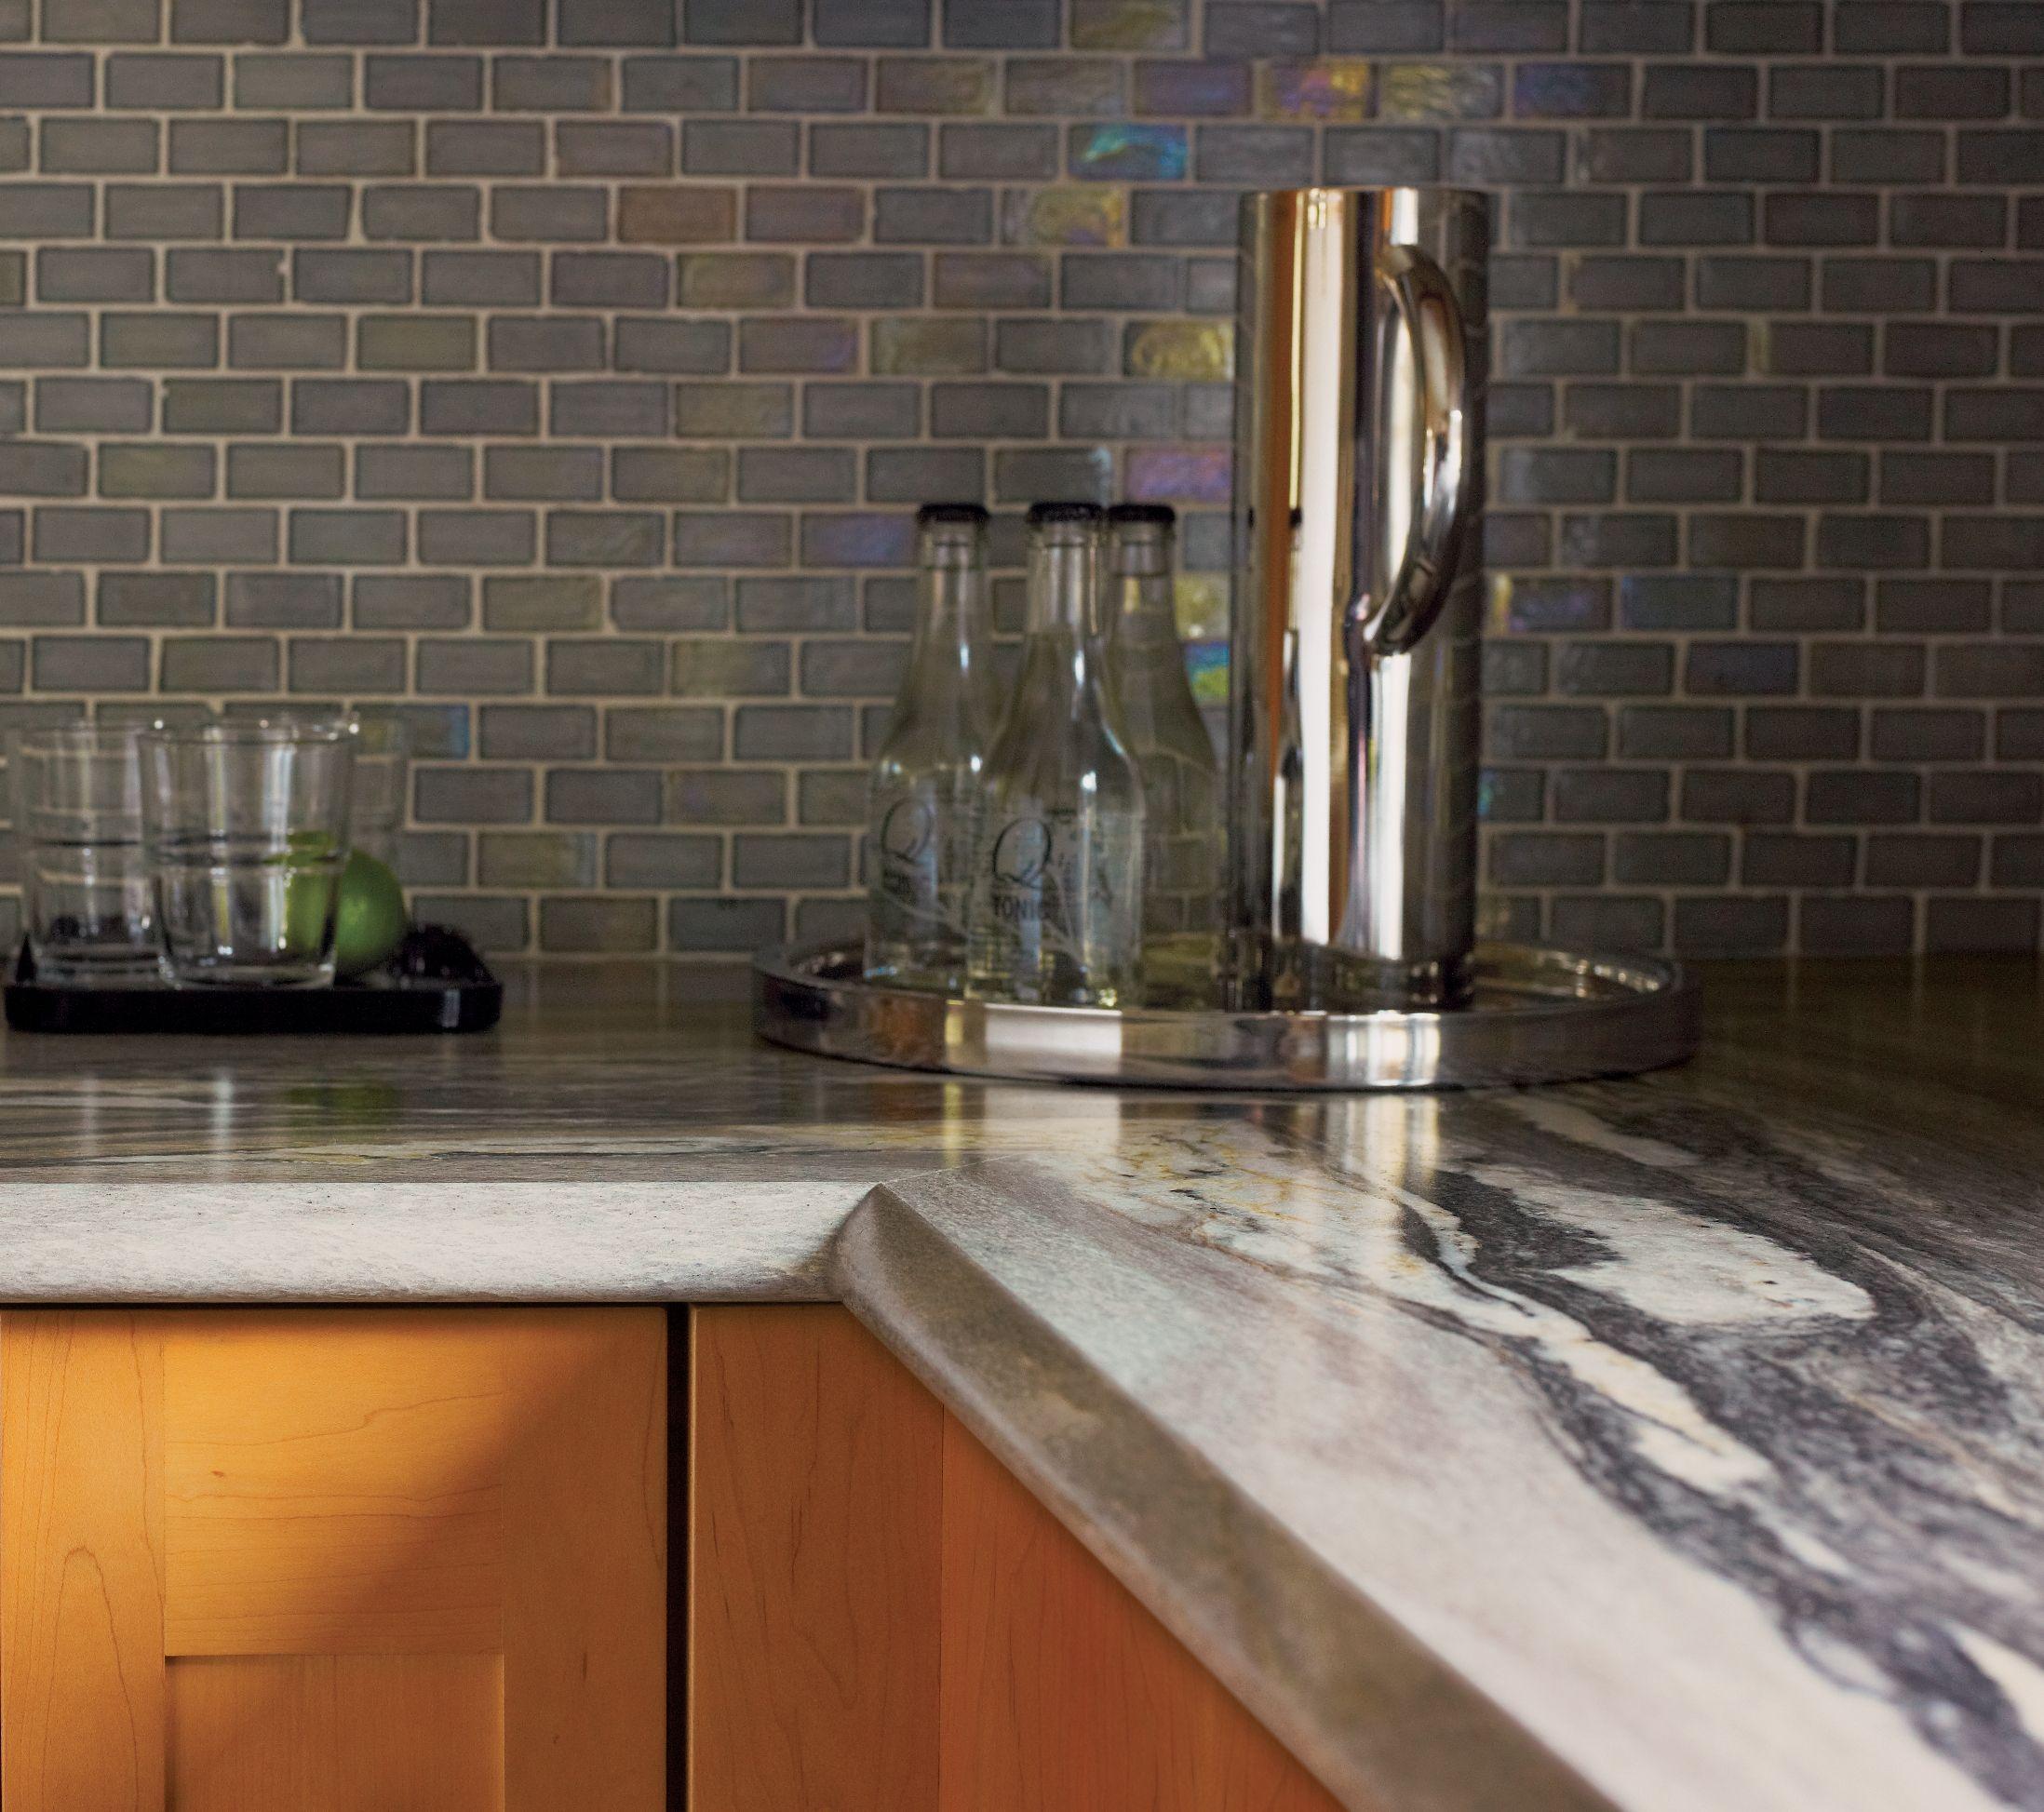 Formica bathroom countertops - Idealedge 3420 Dolce Vita 180fx Ogee Kitchen Countertop Formica Laminatebathroom